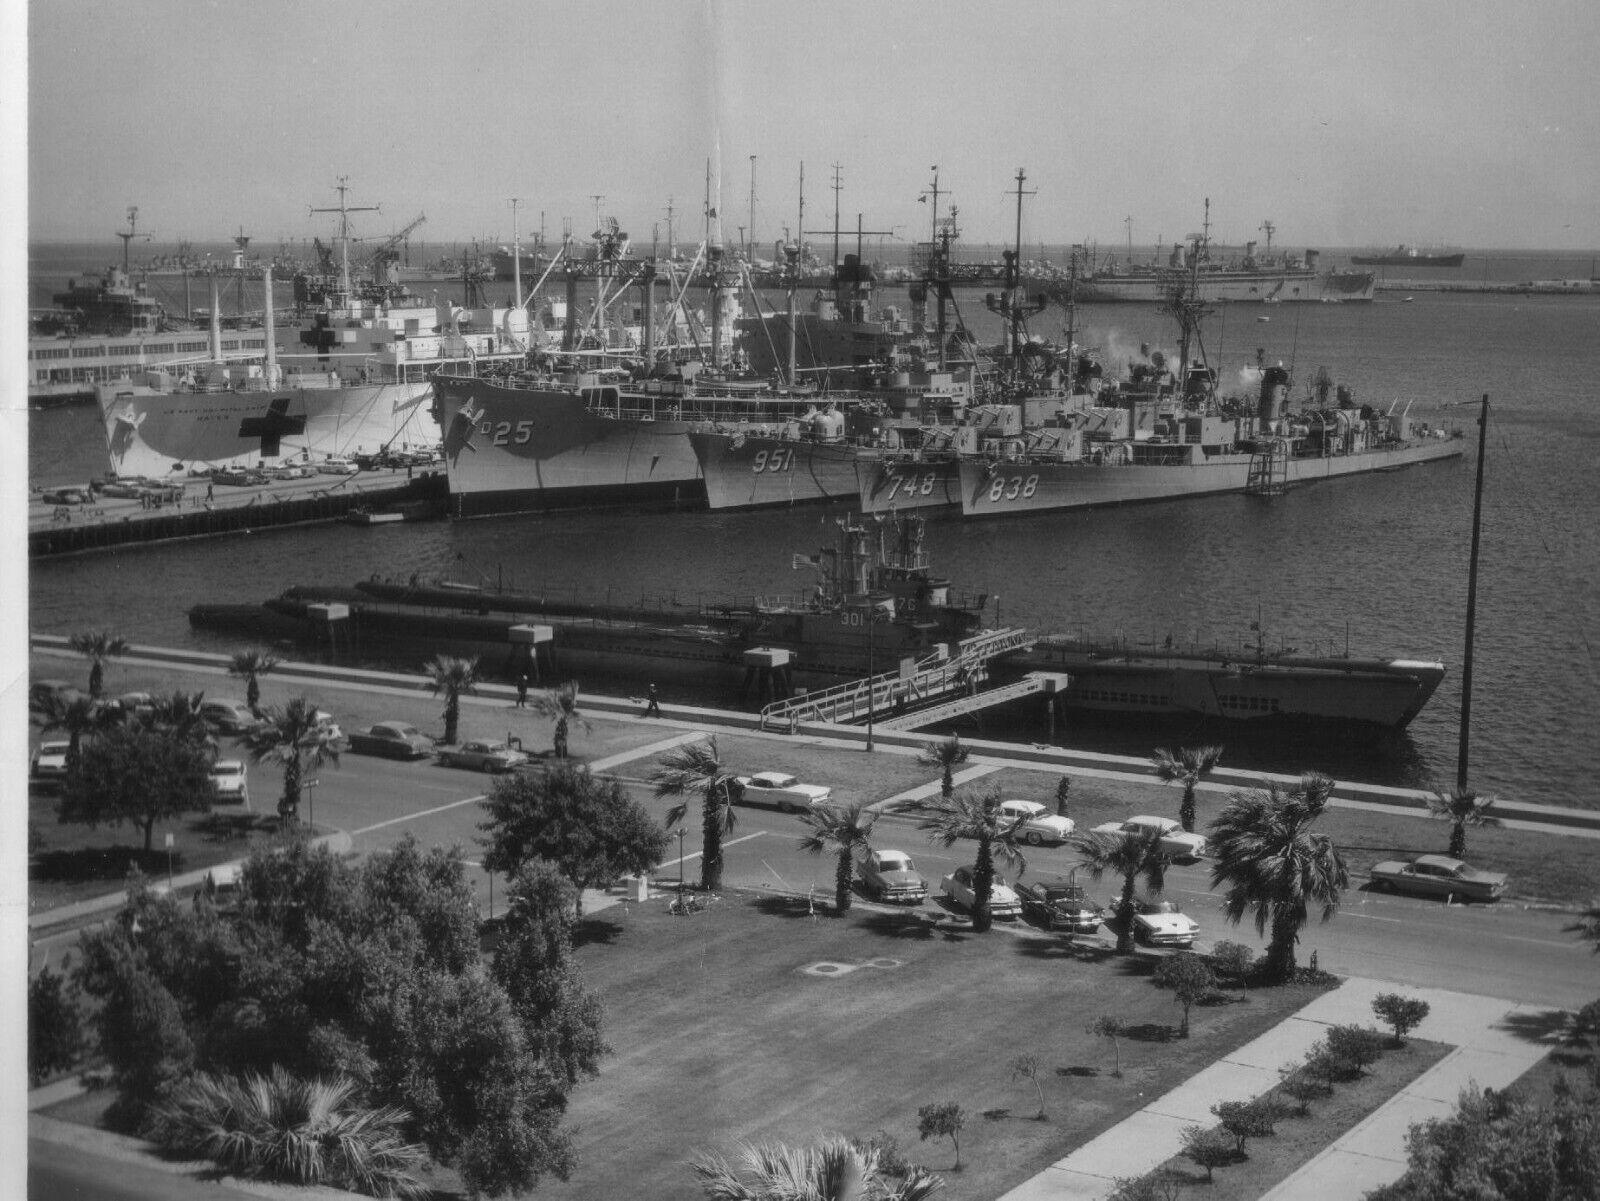 TONKIN GULF YACHT CLUB PATCH VIETNAM USS BB CA CC CG CGN CL CLG DD DDG DE DER DL